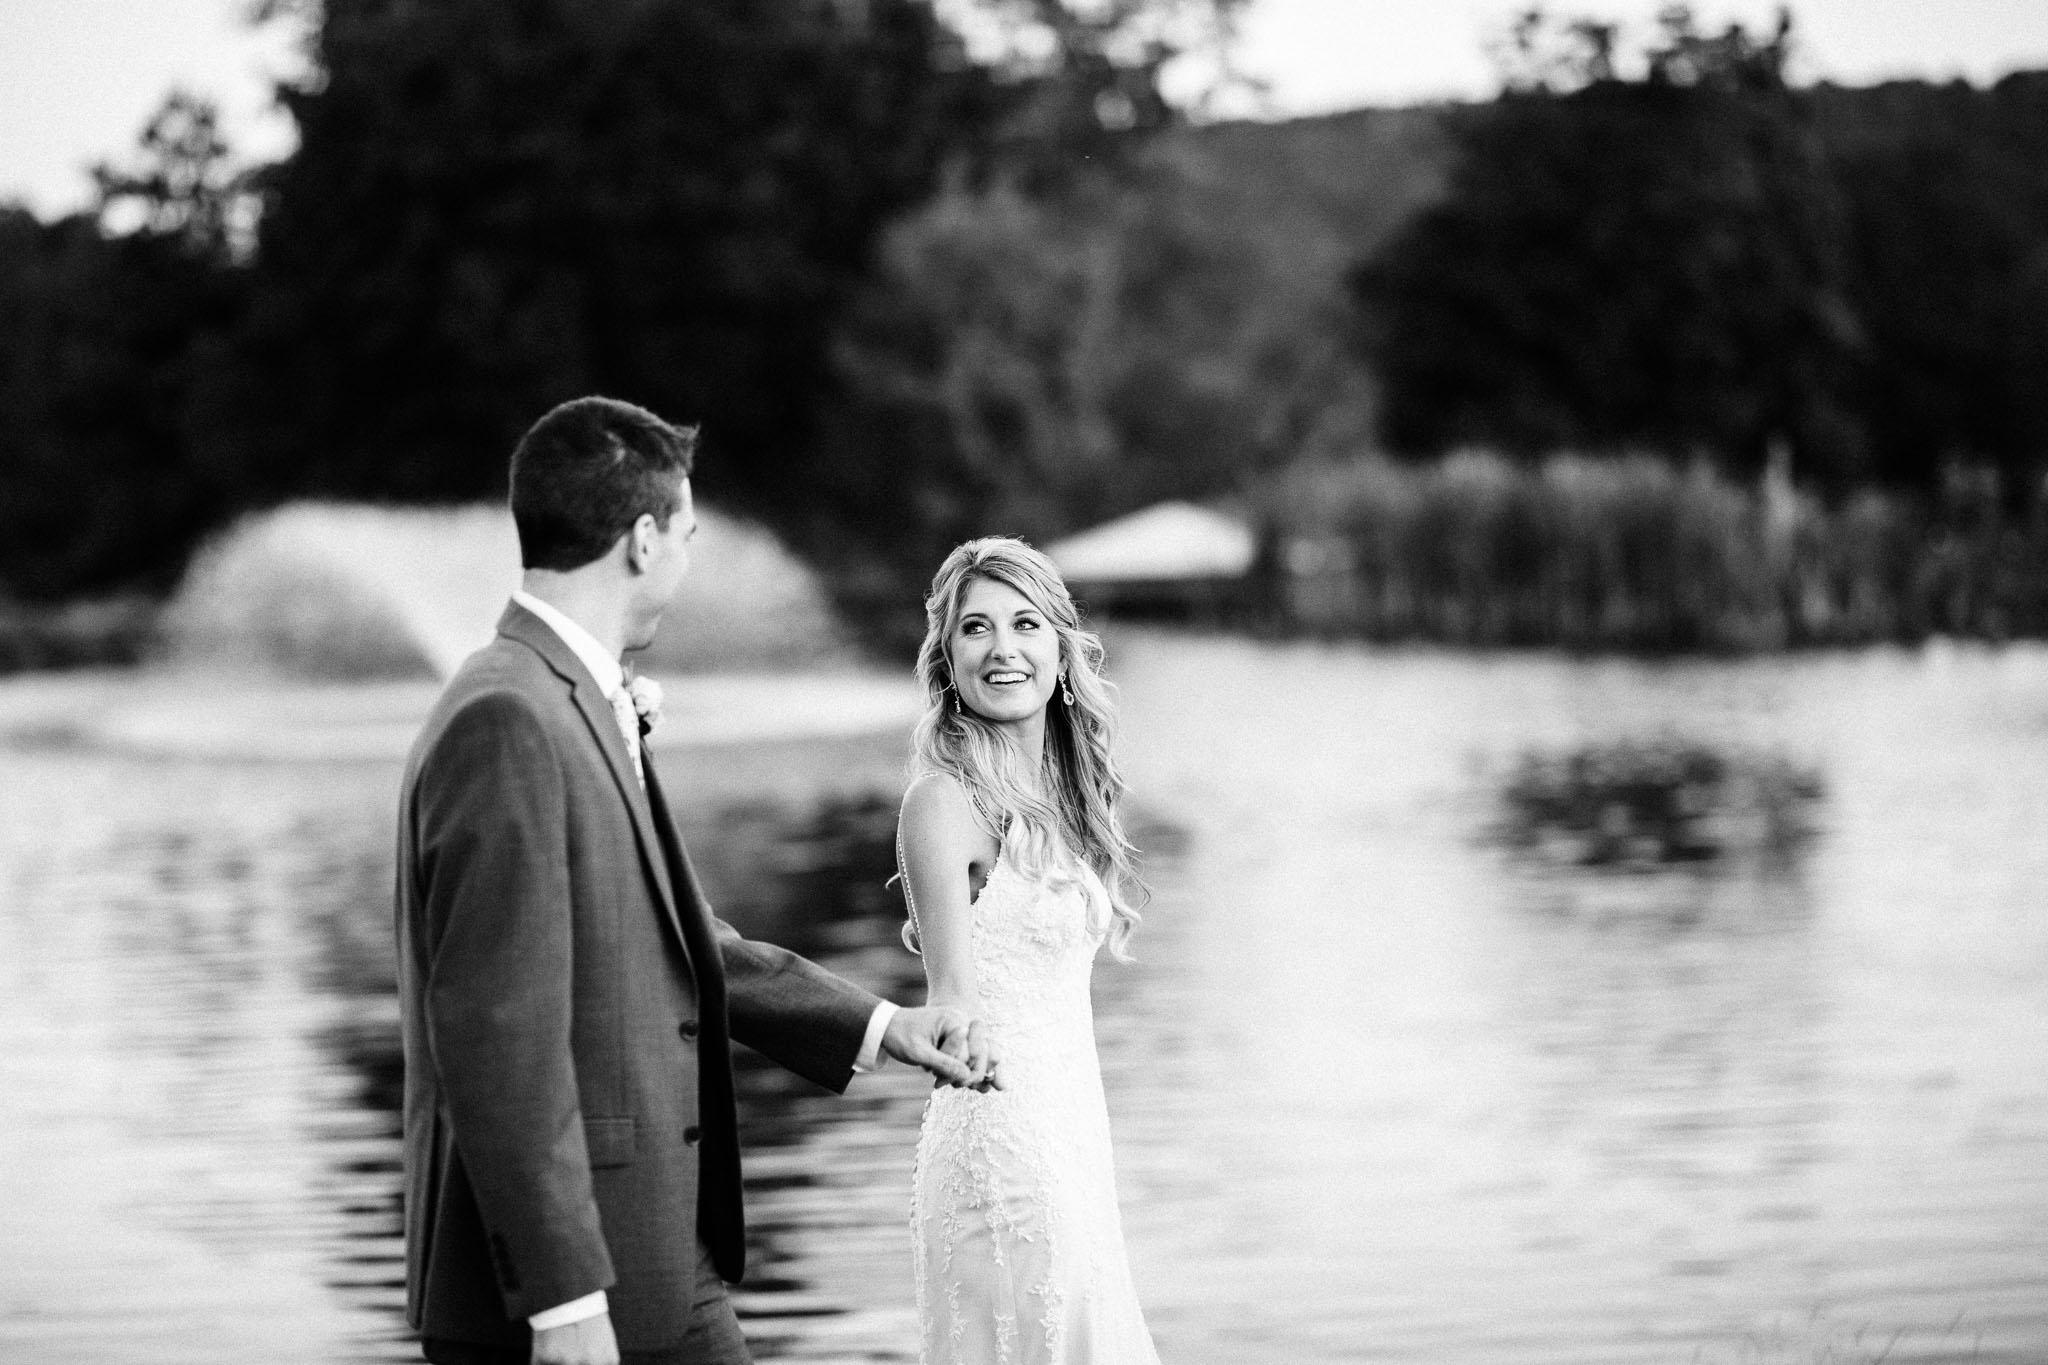 Frosty-Valley-September-Wedding-8450.jpg